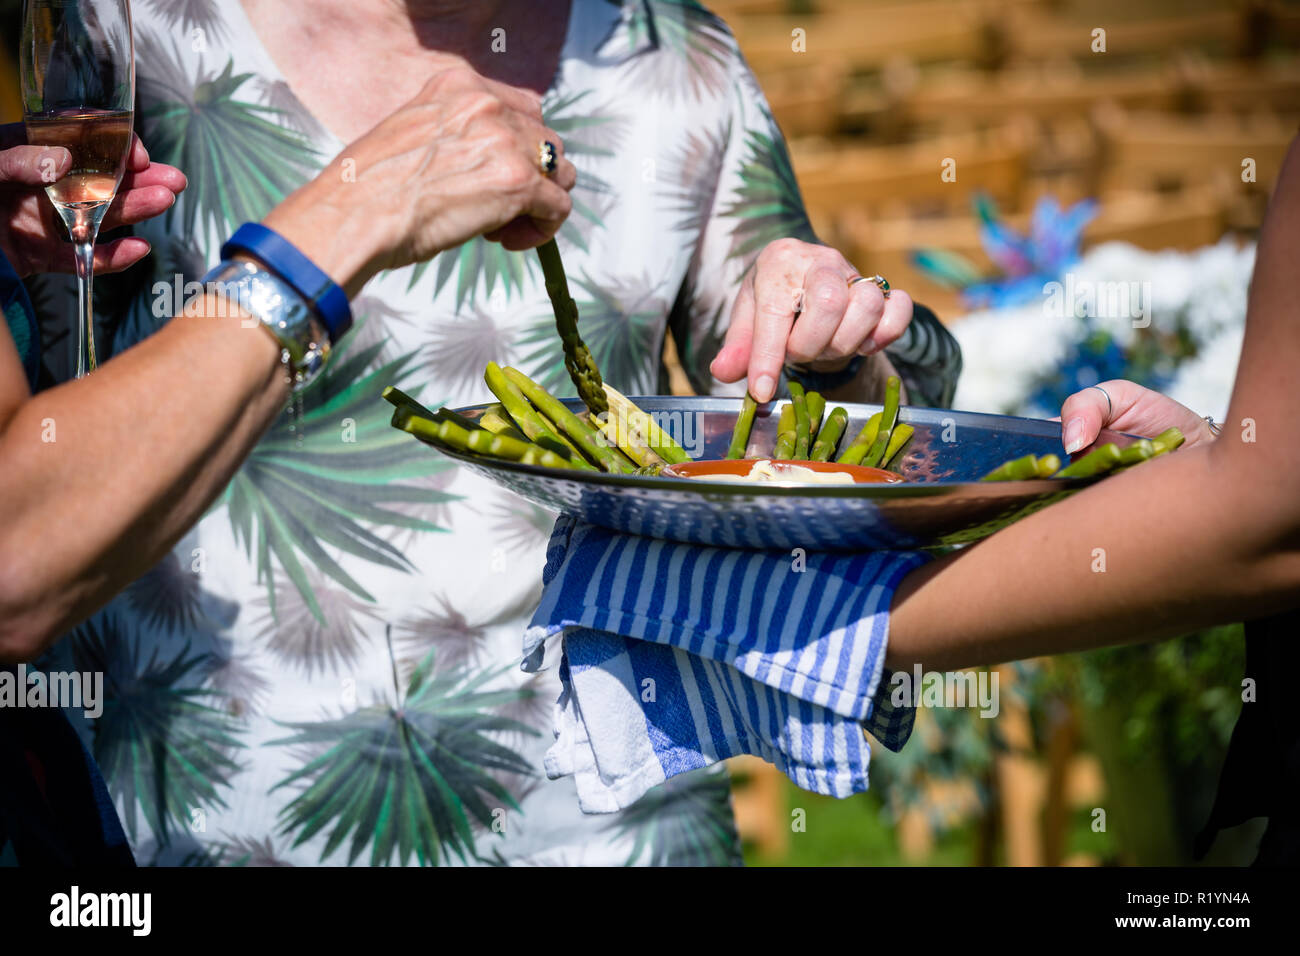 Garden Wedding celebration in England UK during the summer of 2018 - Stock Image